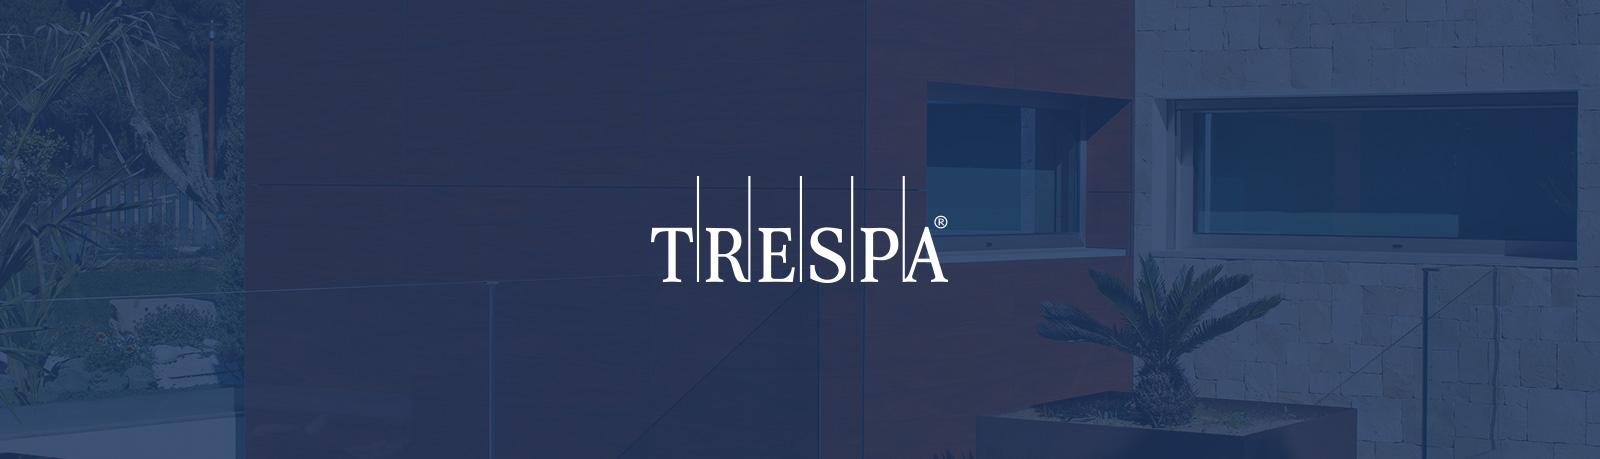 03_Trespa